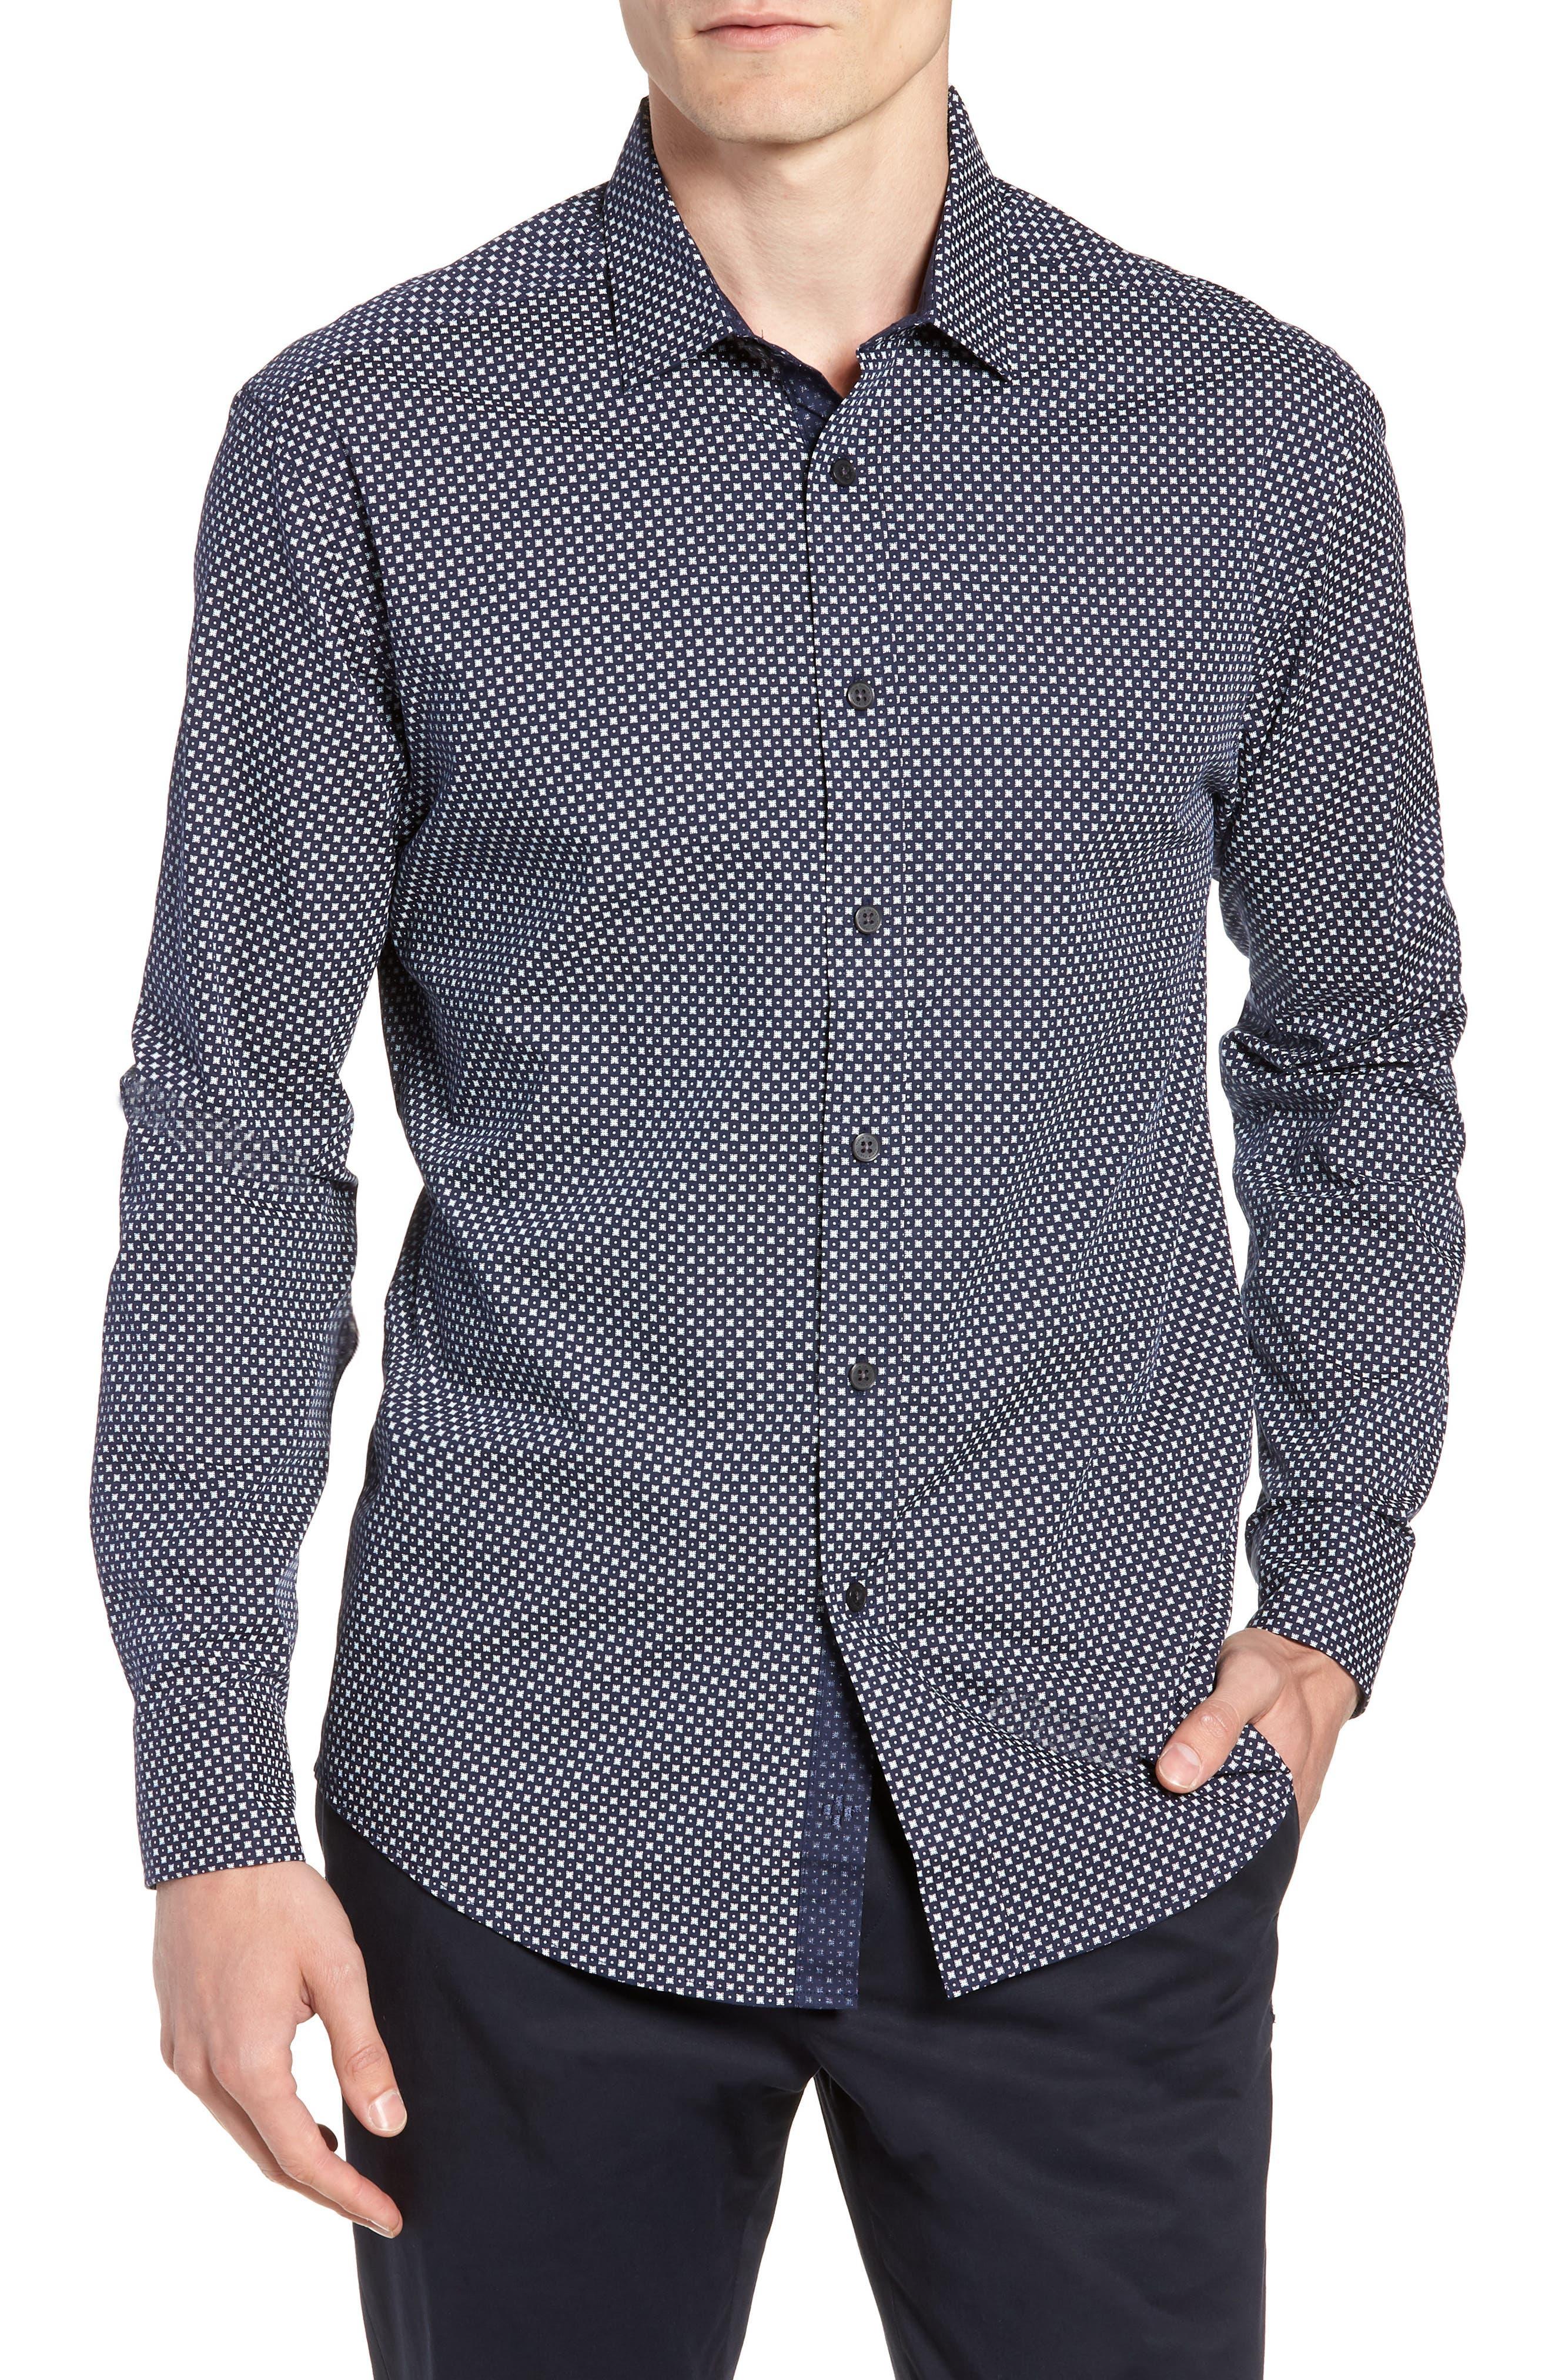 Regular Fit Geometric Dot Sport Shirt,                         Main,                         color, NAVY/ WHITE POPLIN PRINT